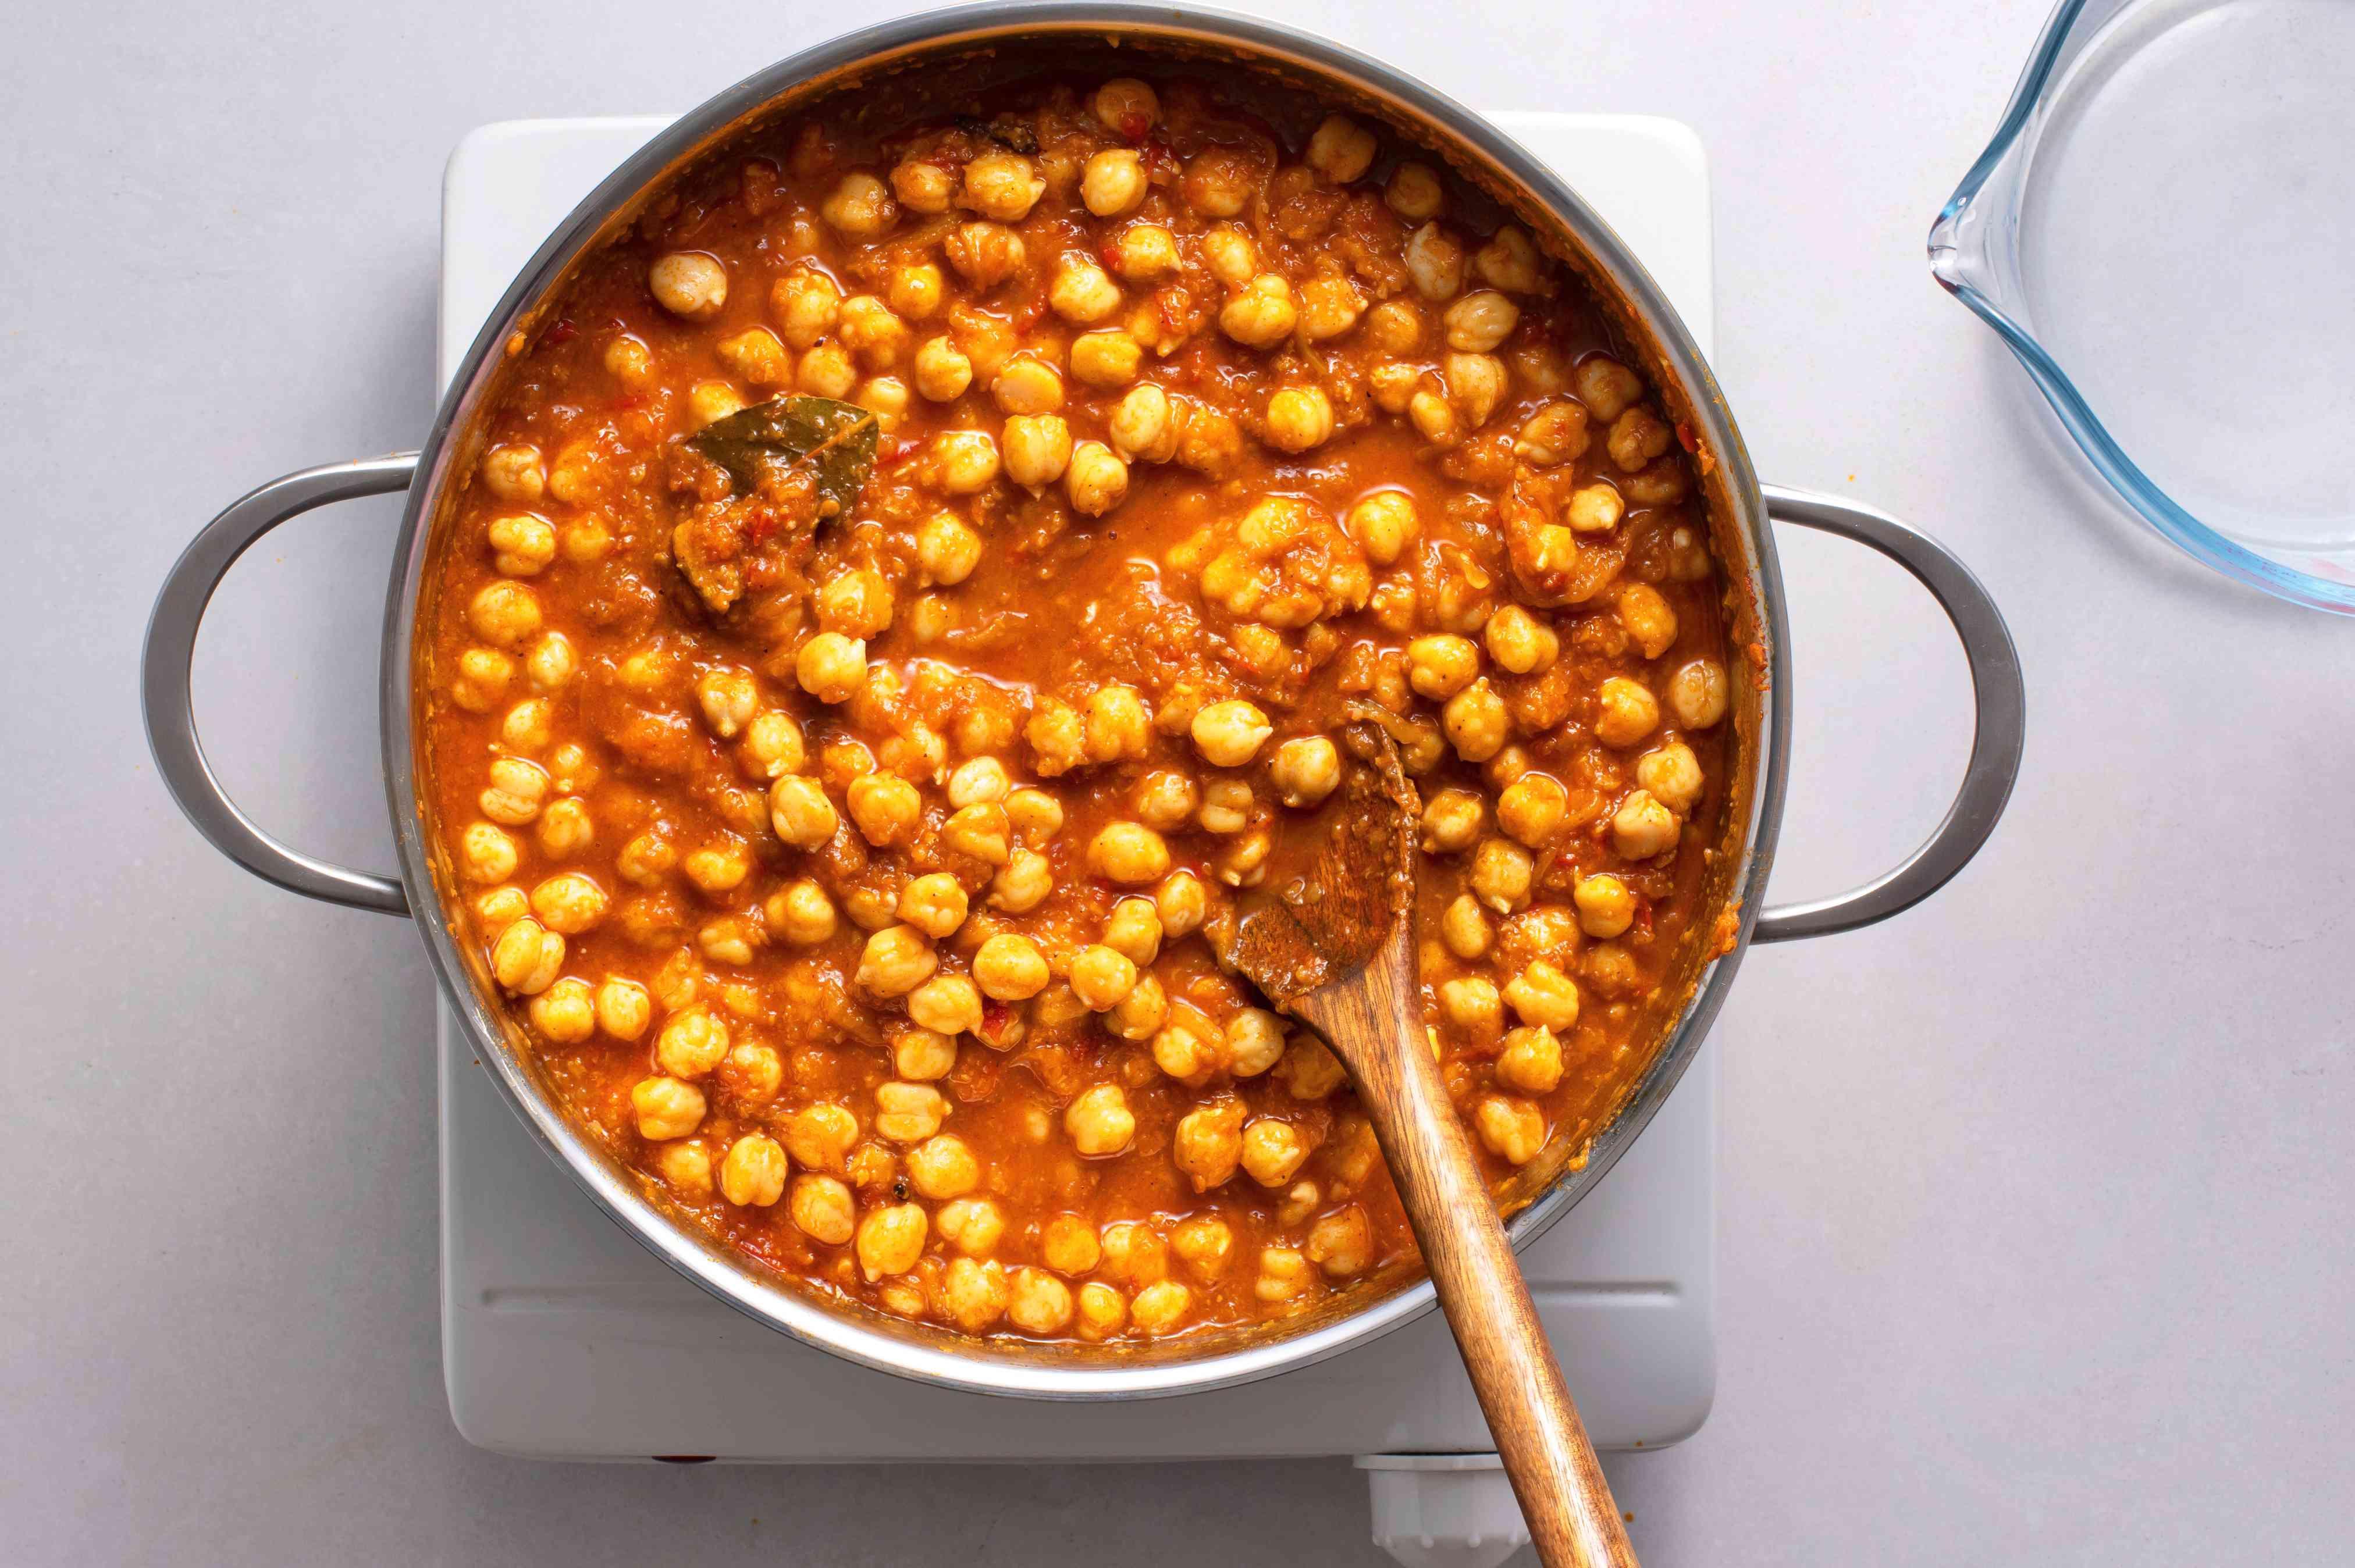 Add salt to taste and hot water to make a gravy